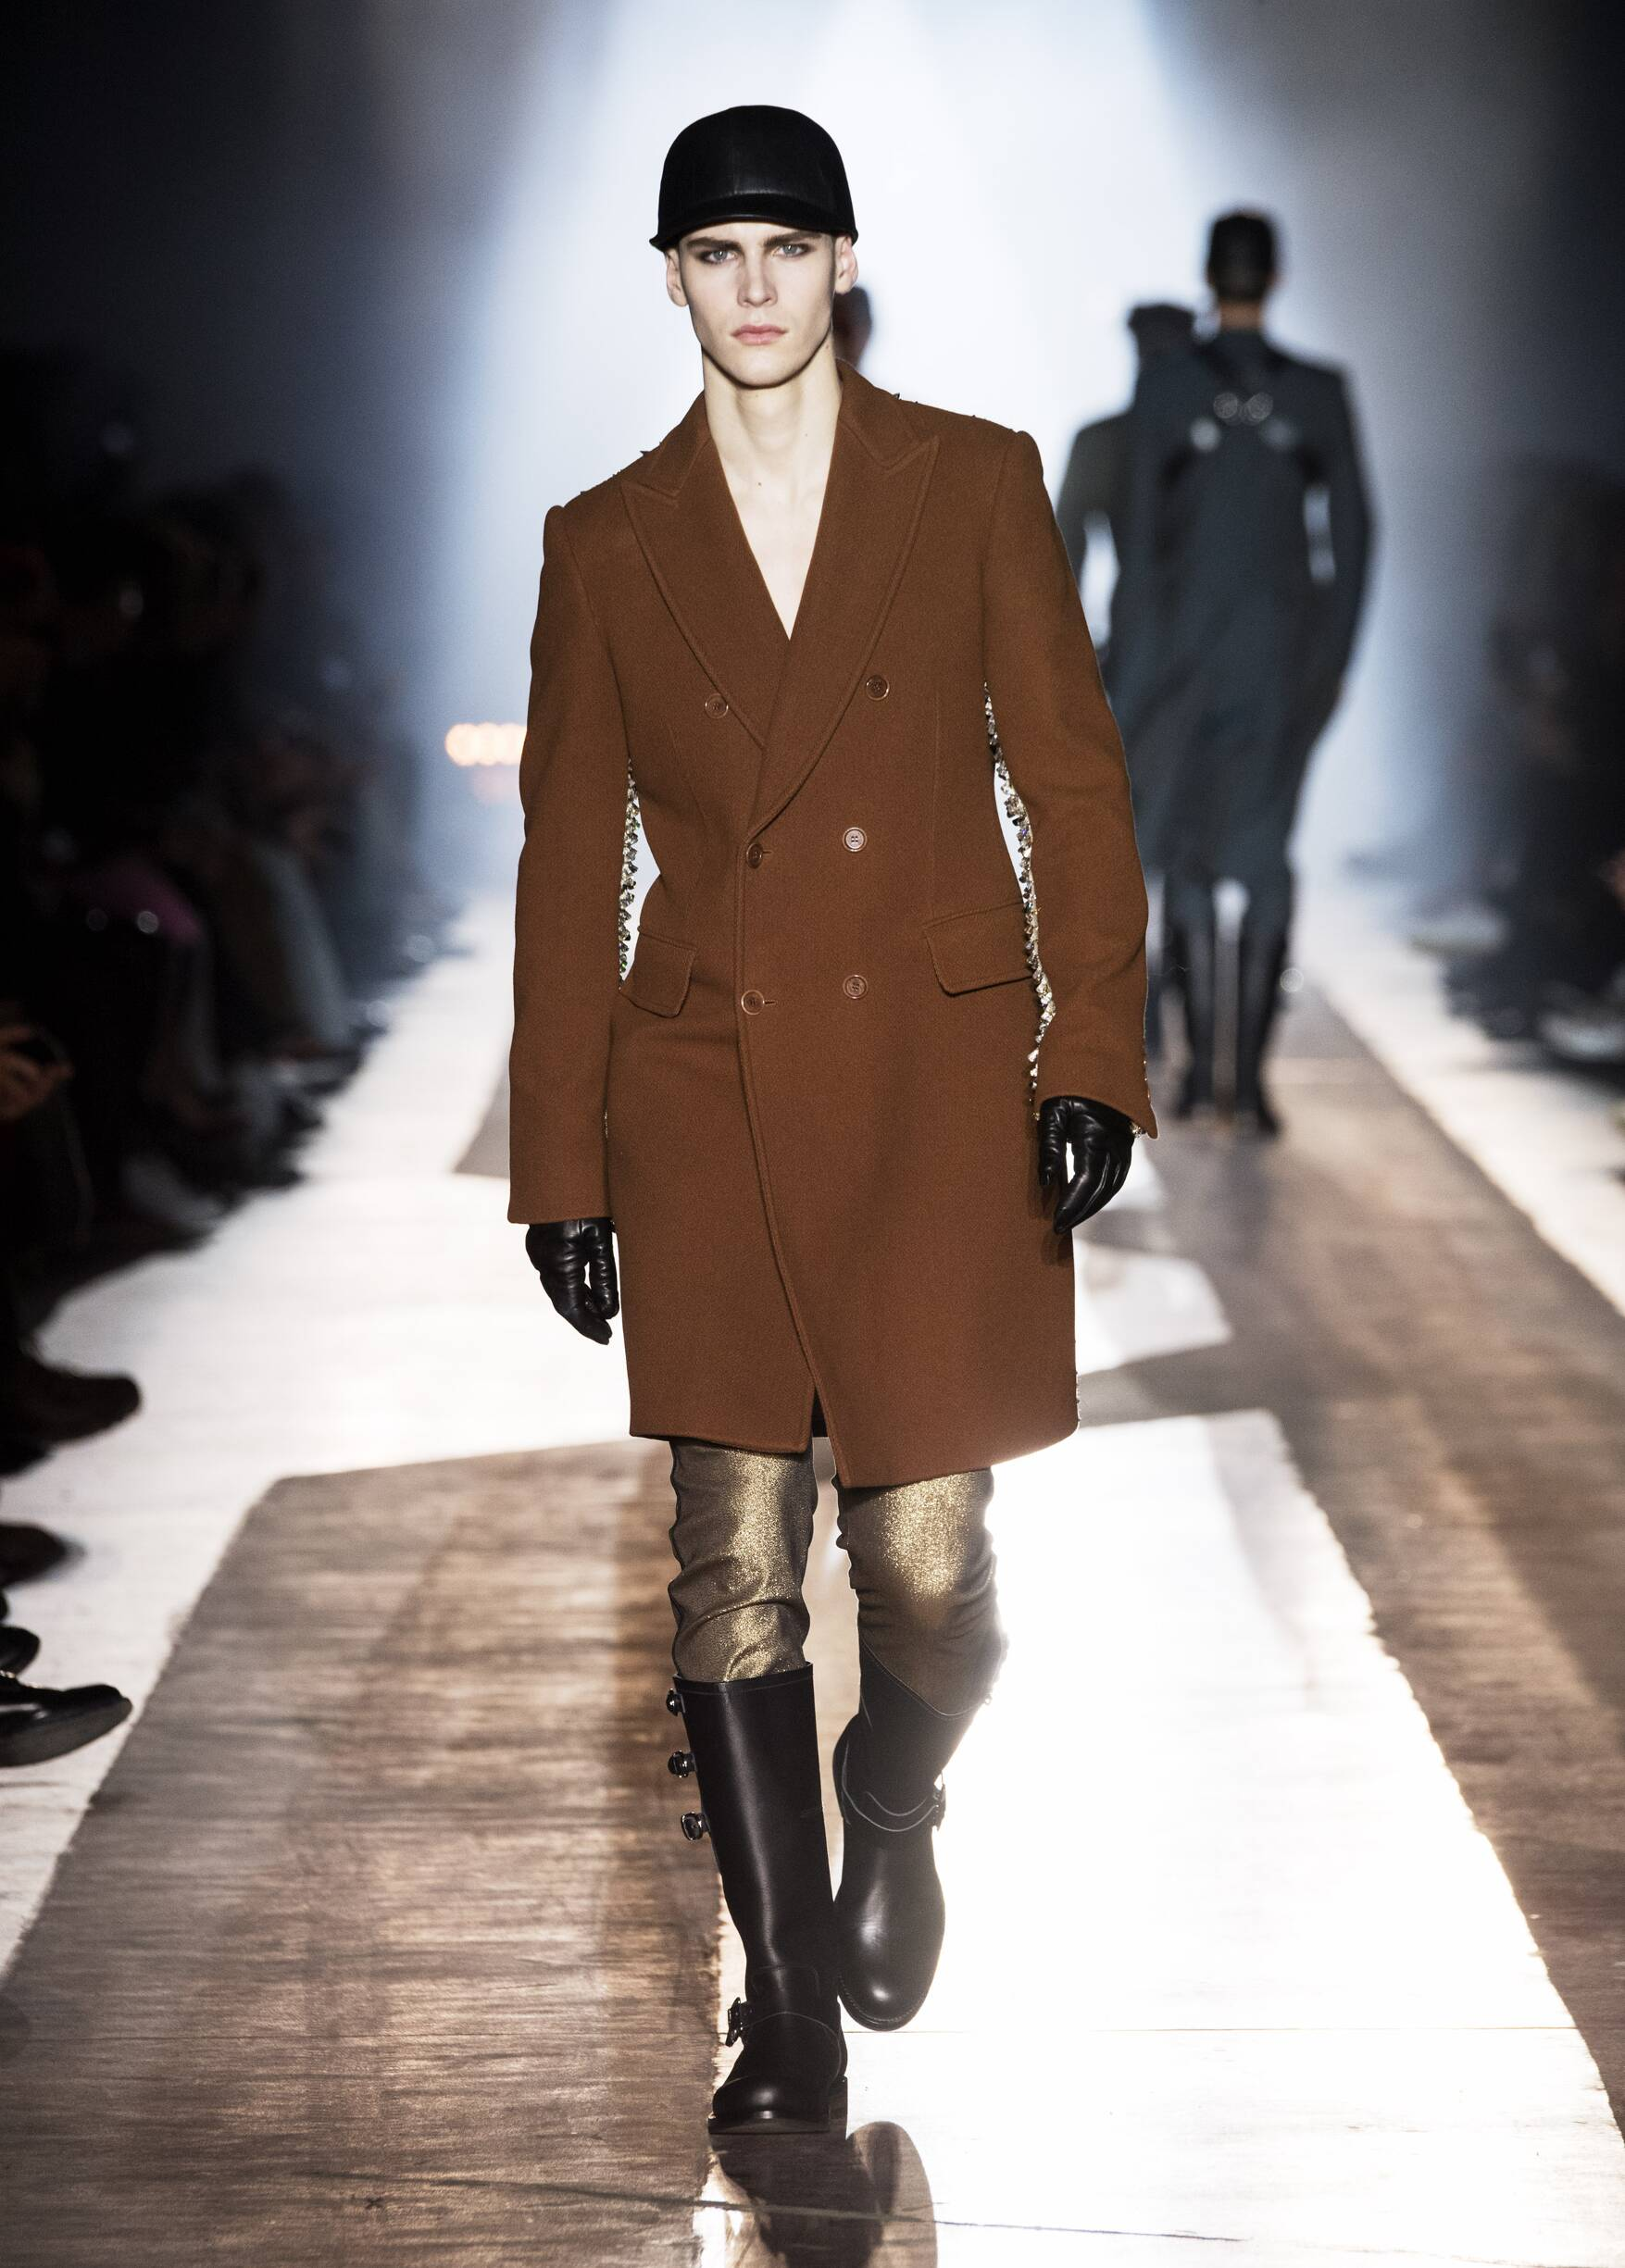 Moschino FW 2018 Menswear